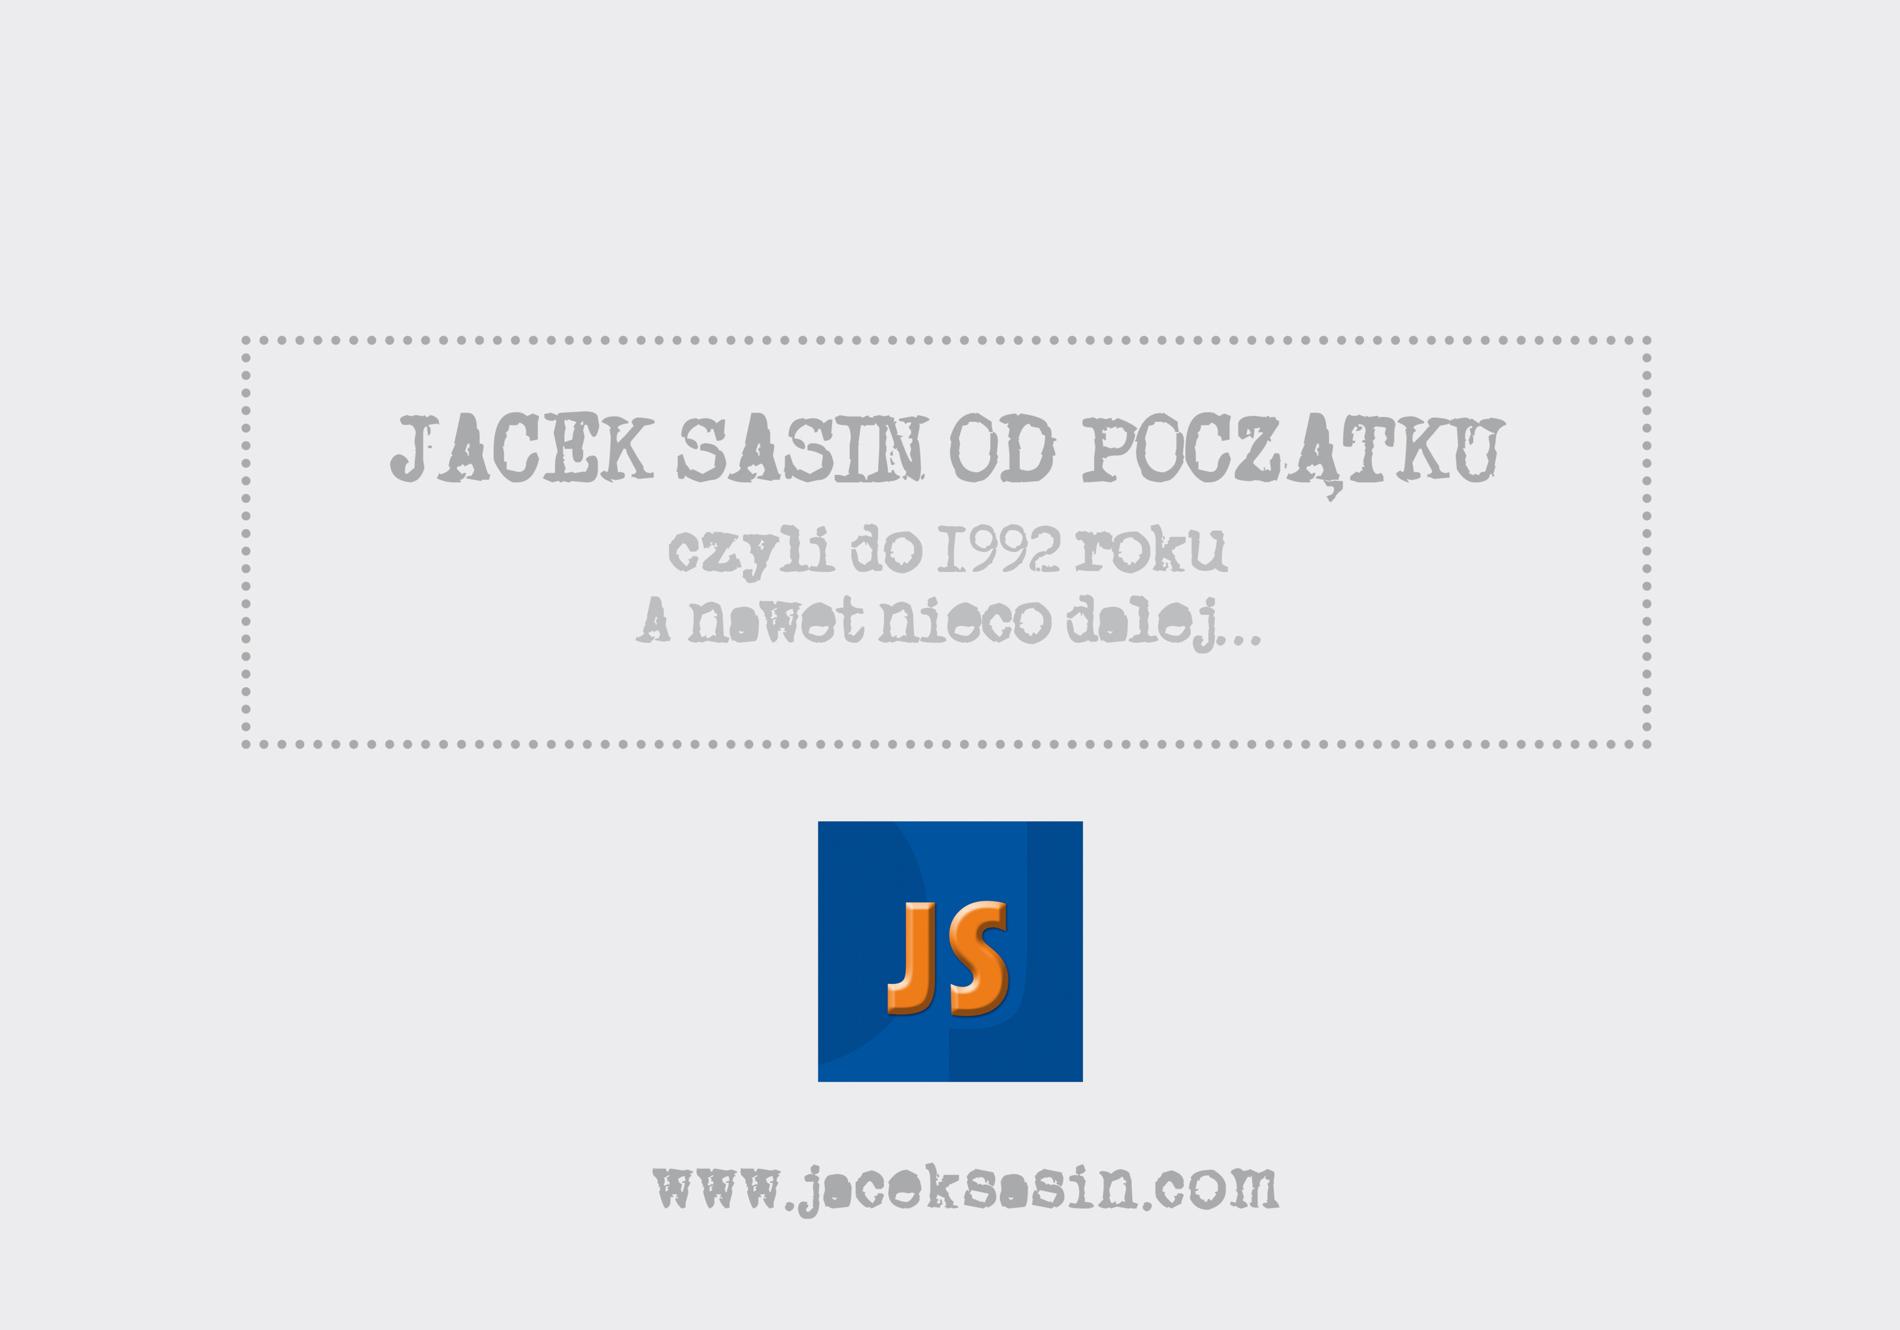 01a_Jacek-SASIN_Od-Poczatku-